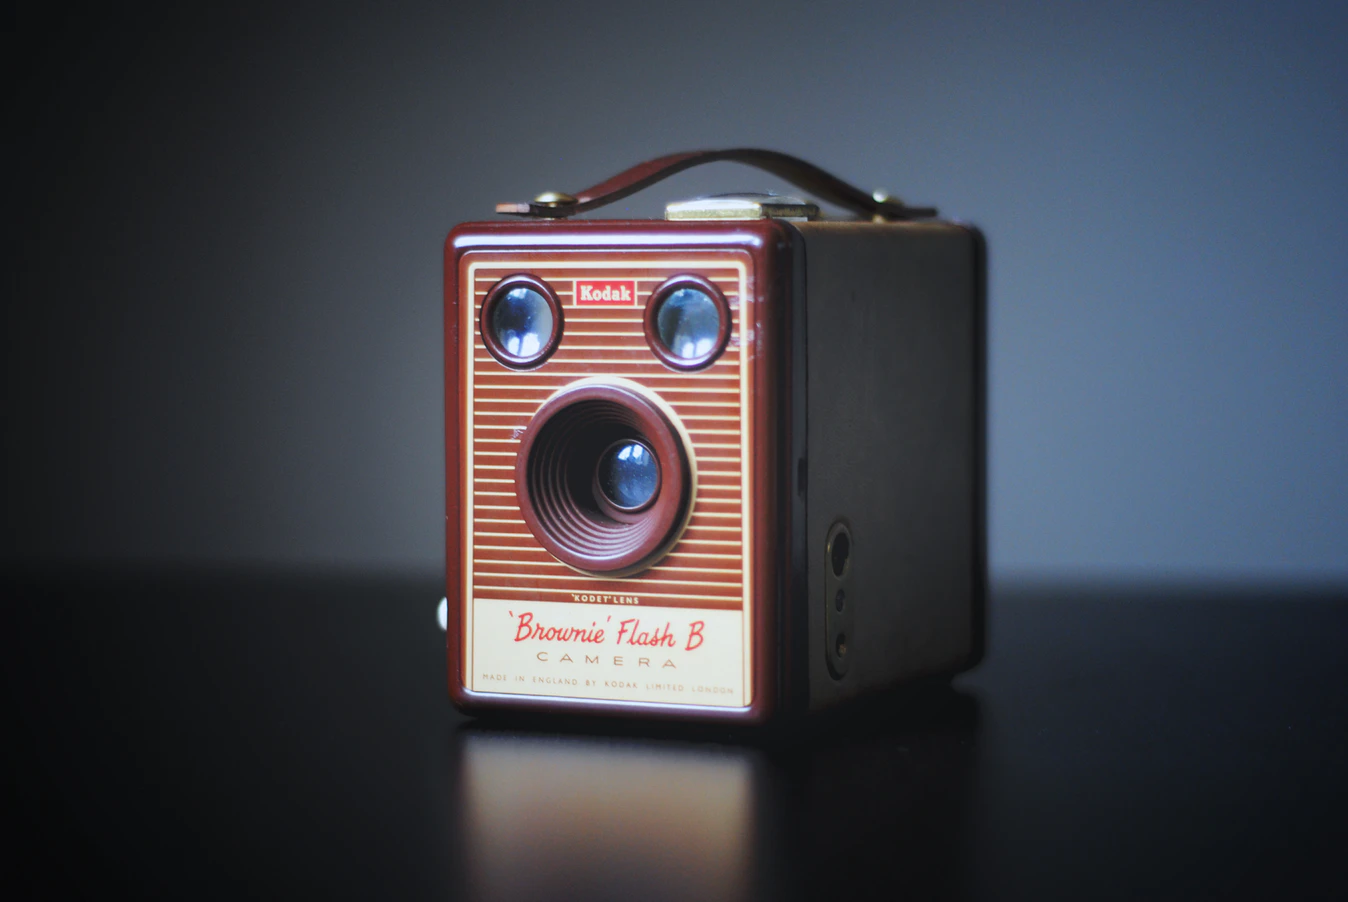 Uma câmera Brownie da Kodak